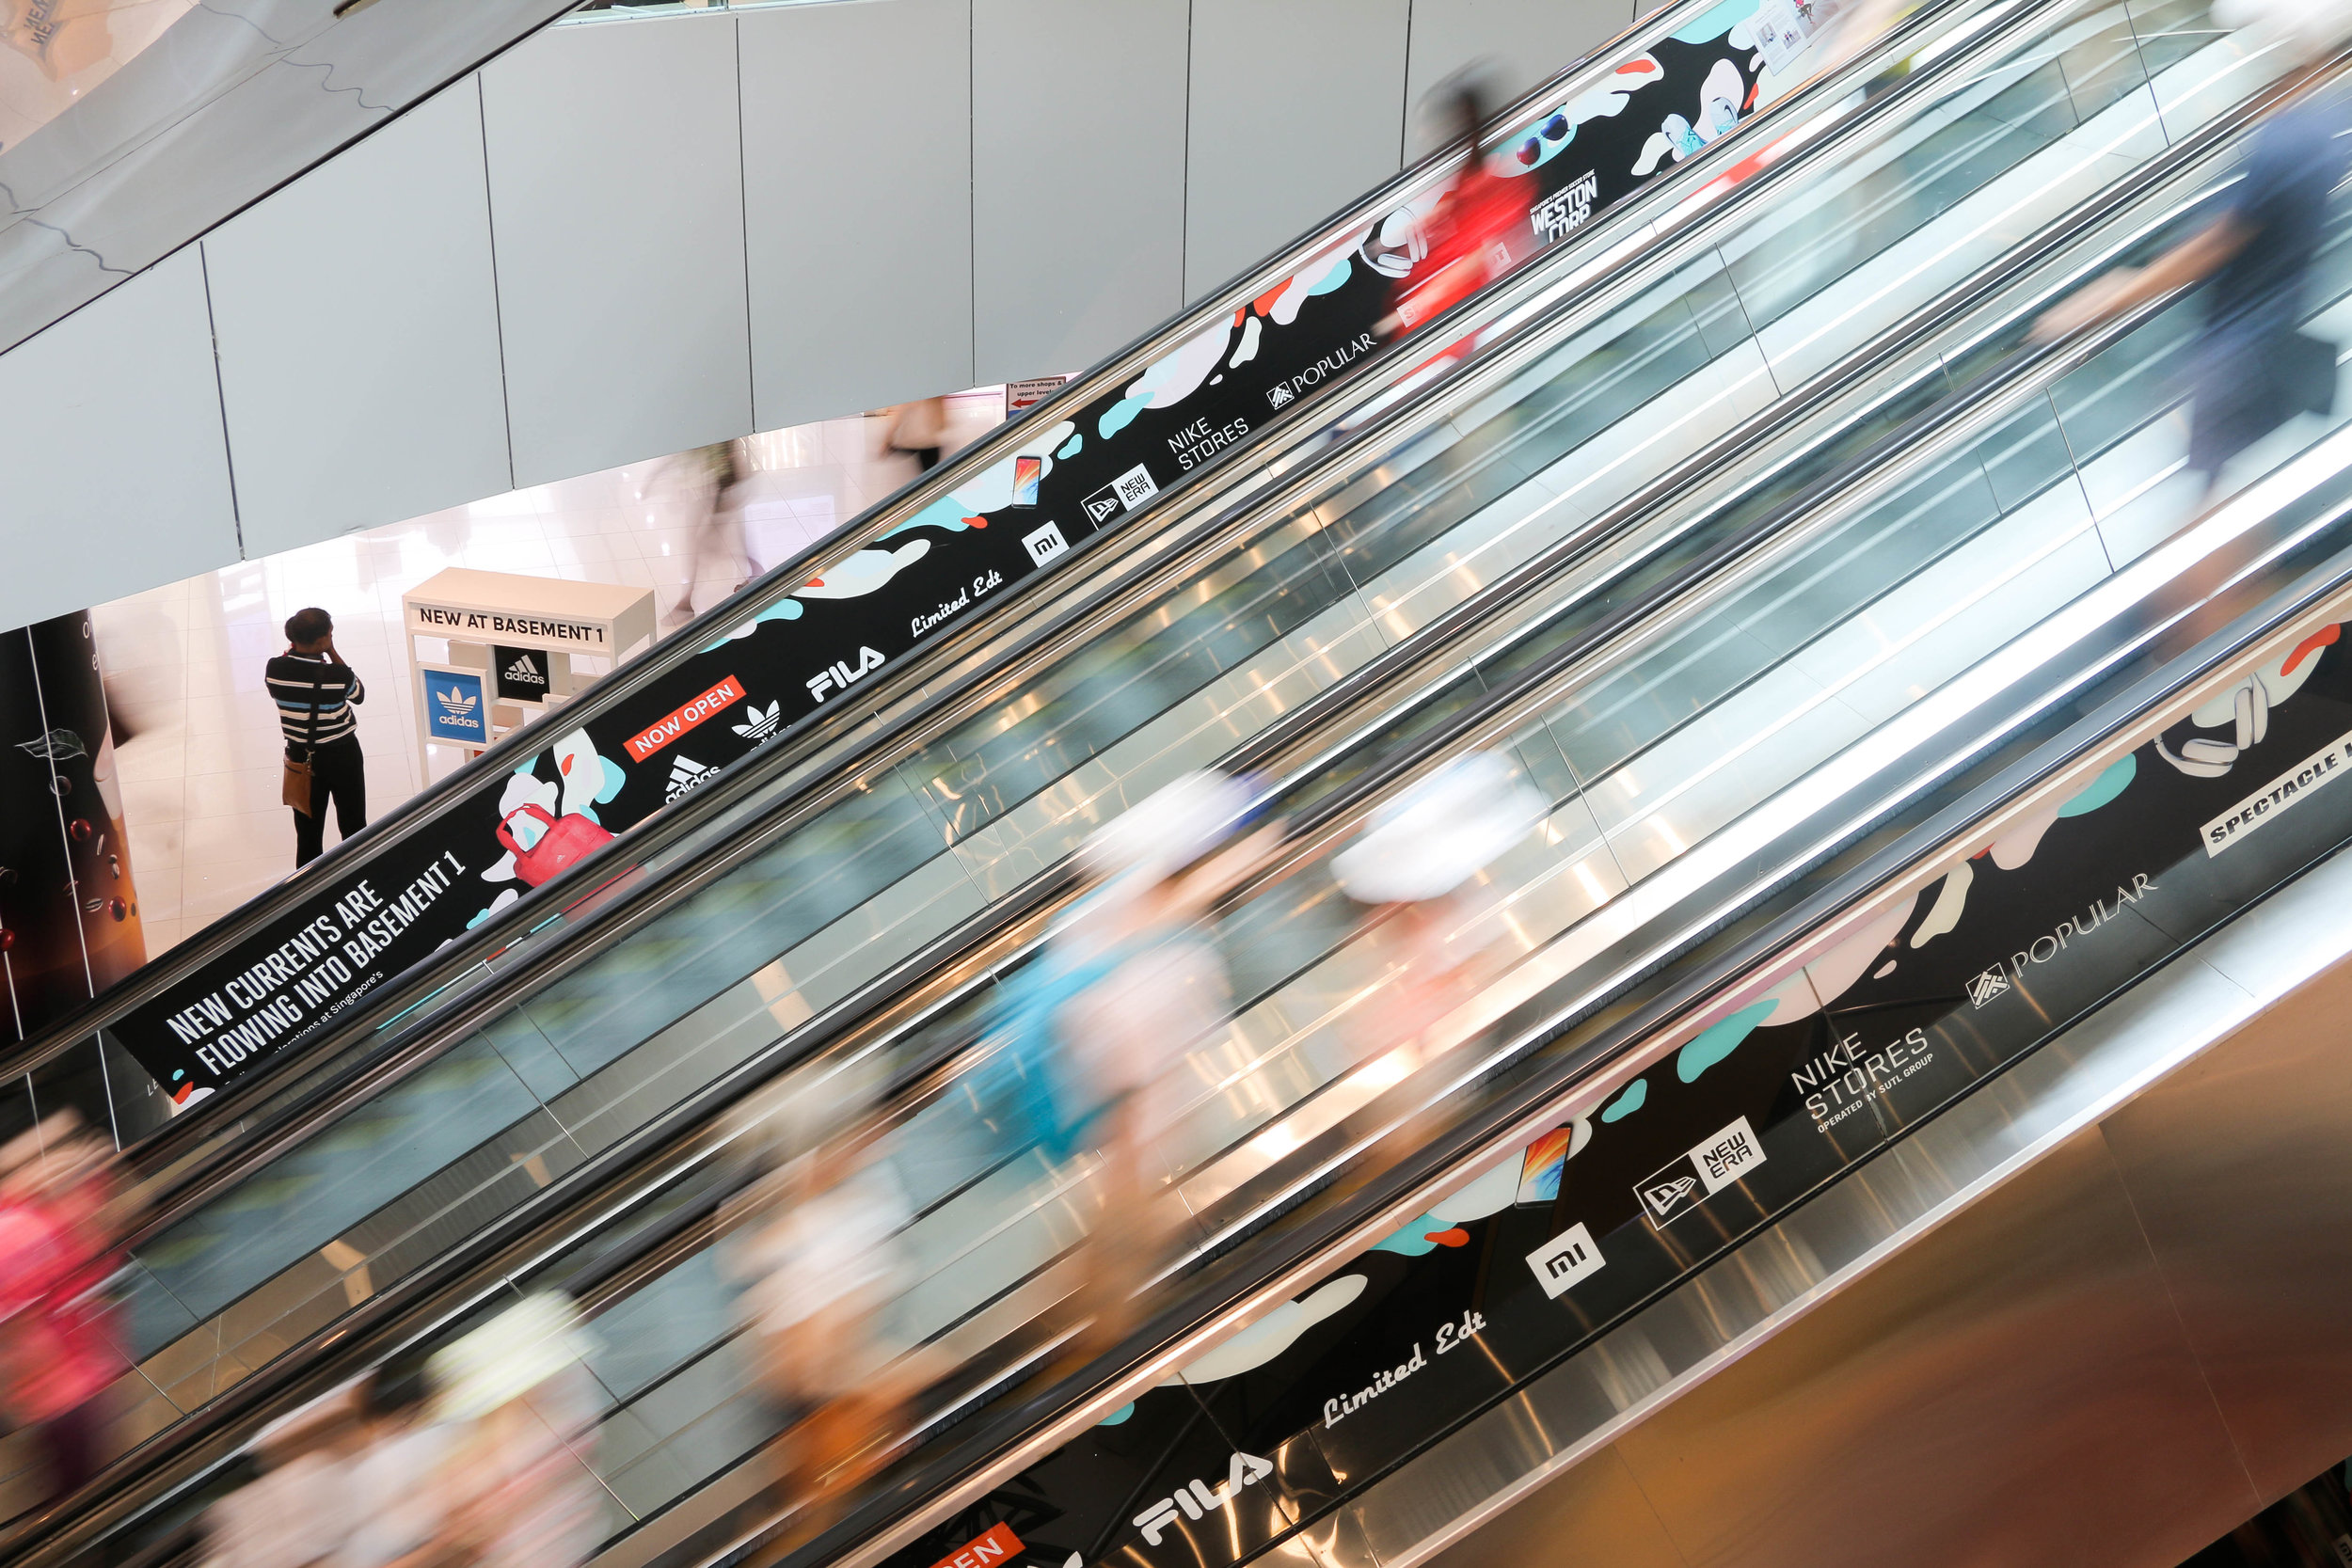 outeredit vivocity escalators